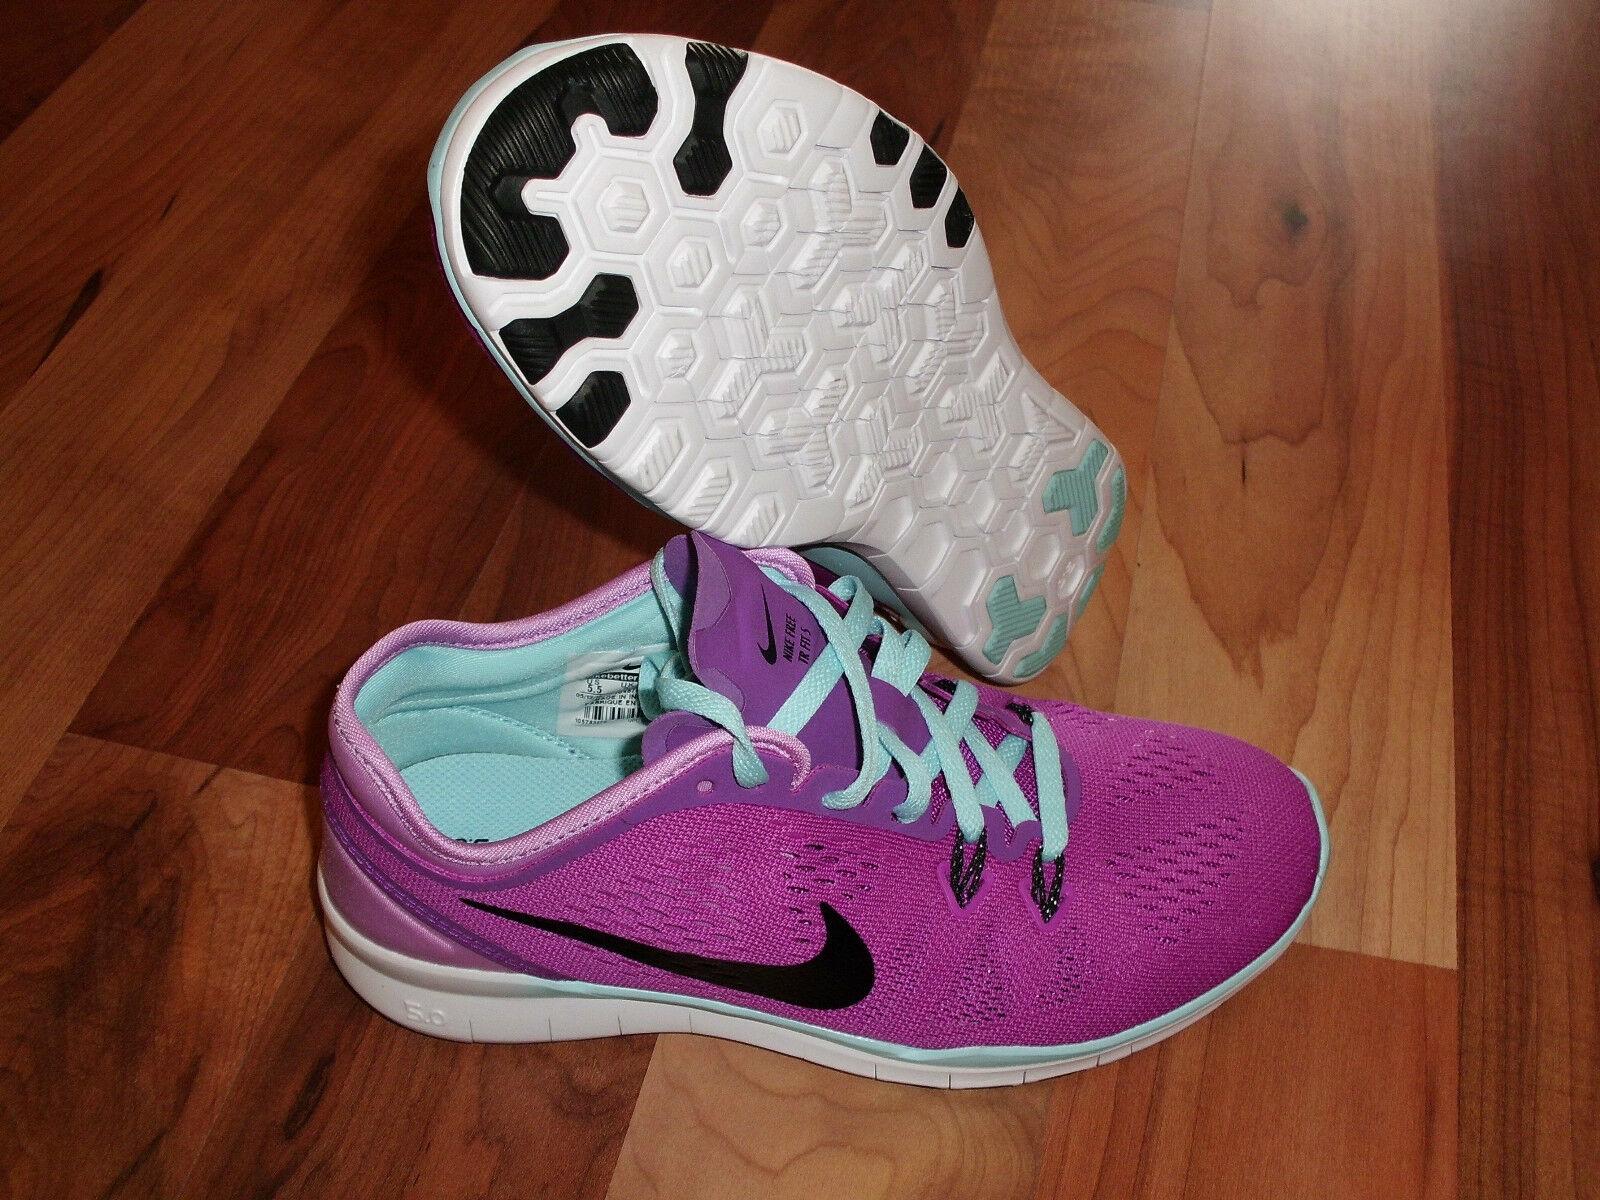 Nike Free 5.0 Tr Fit 5 Running Training violet noir 704674 500 femmes SZ 5.5